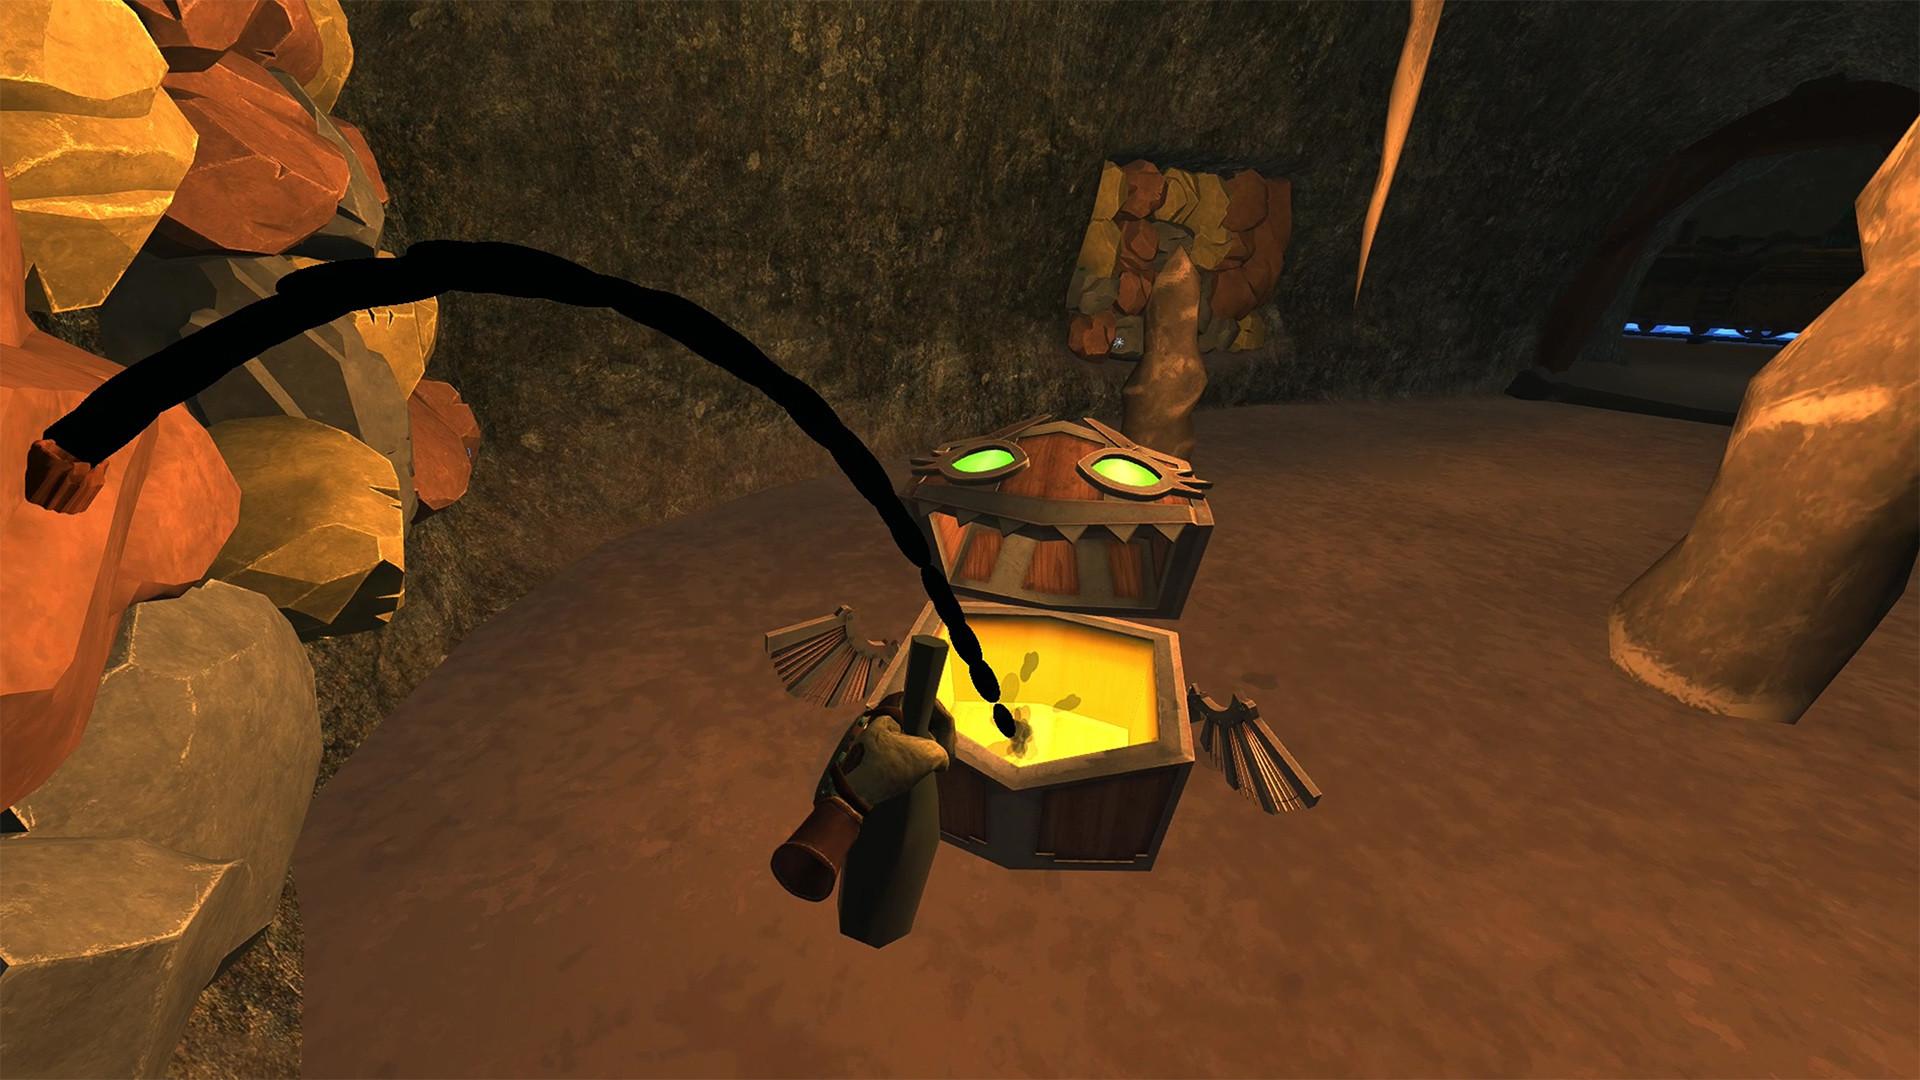 Oculus Quest 游戏《Cave Digger: Riches》地下挖矿者插图(1)